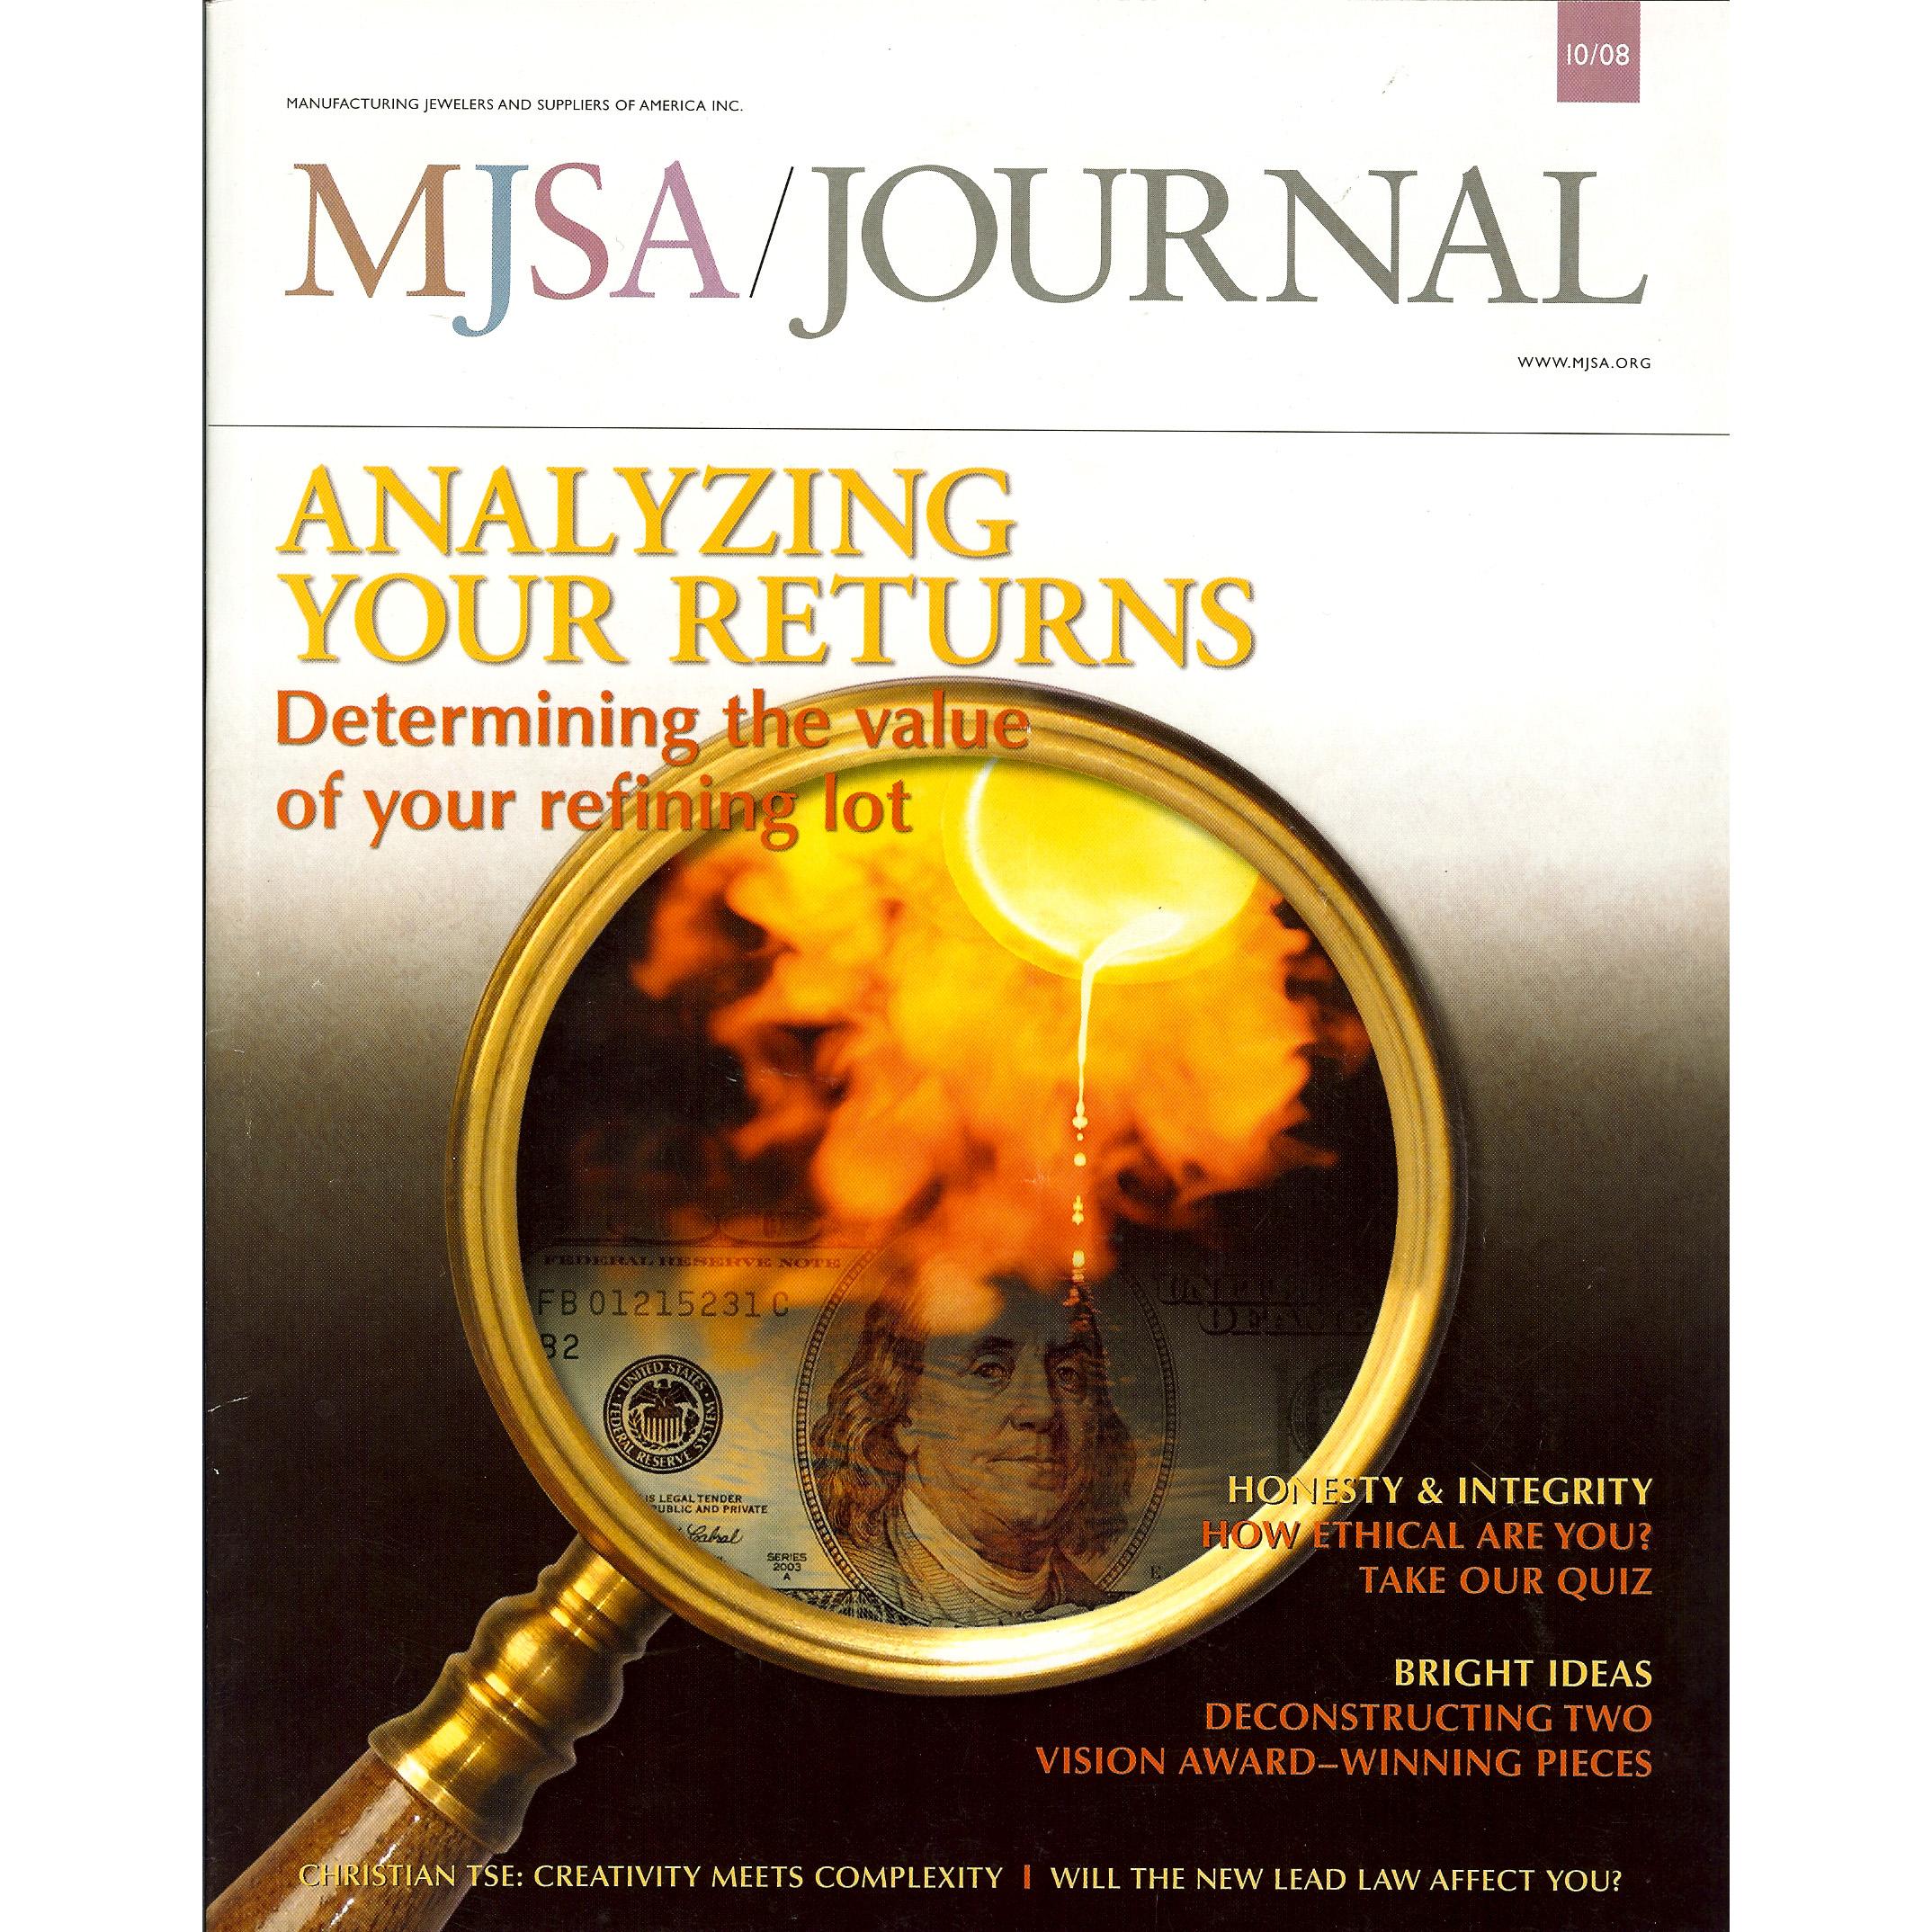 MJSA Journal - October 2008